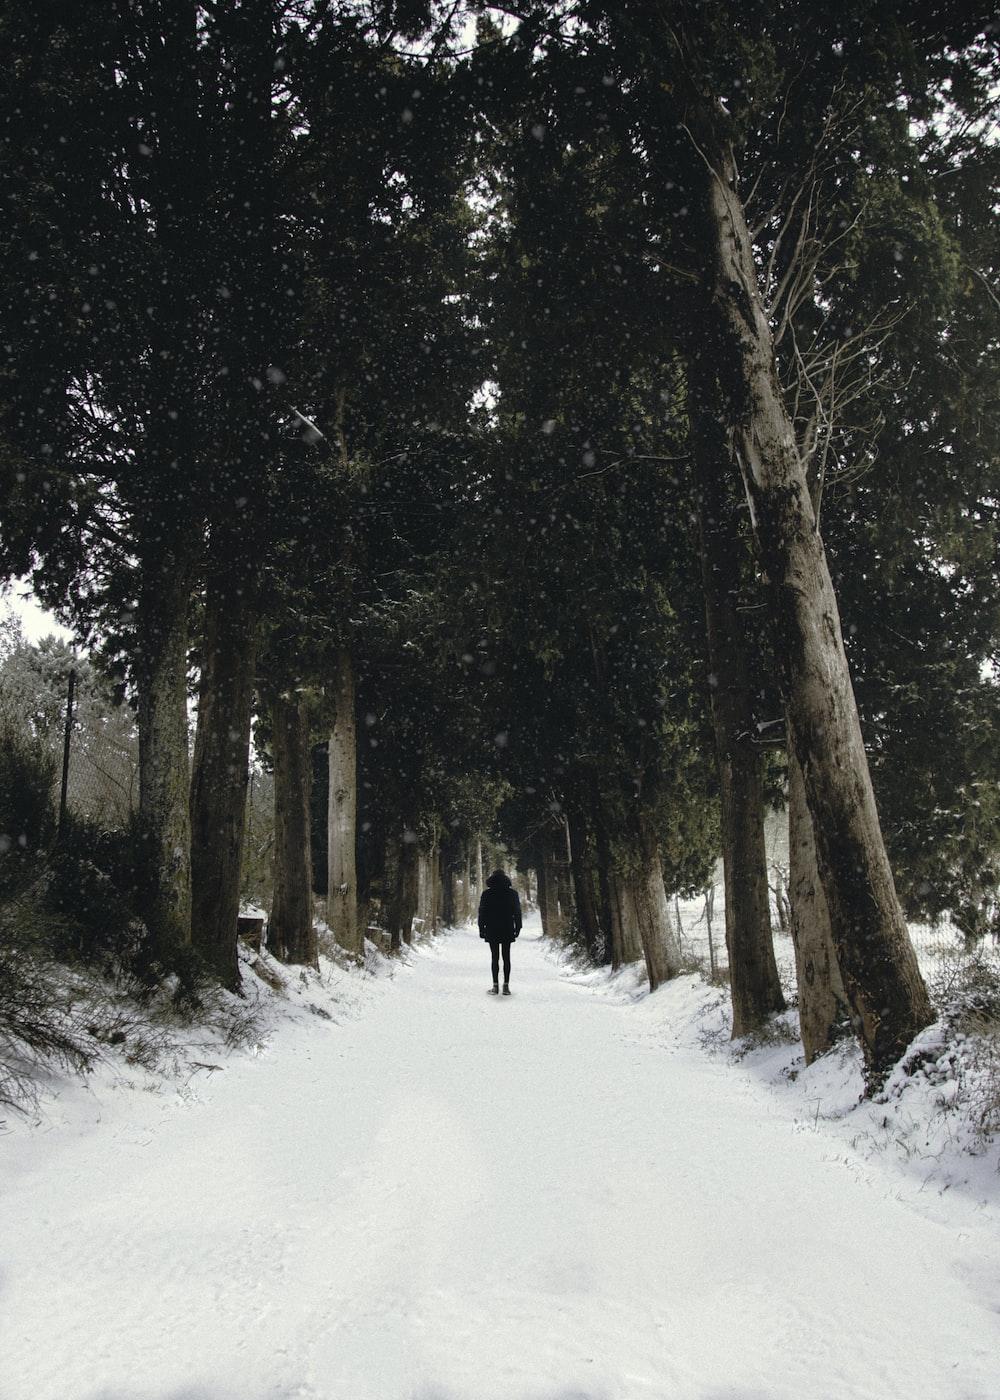 man walking on snow pathway between trees